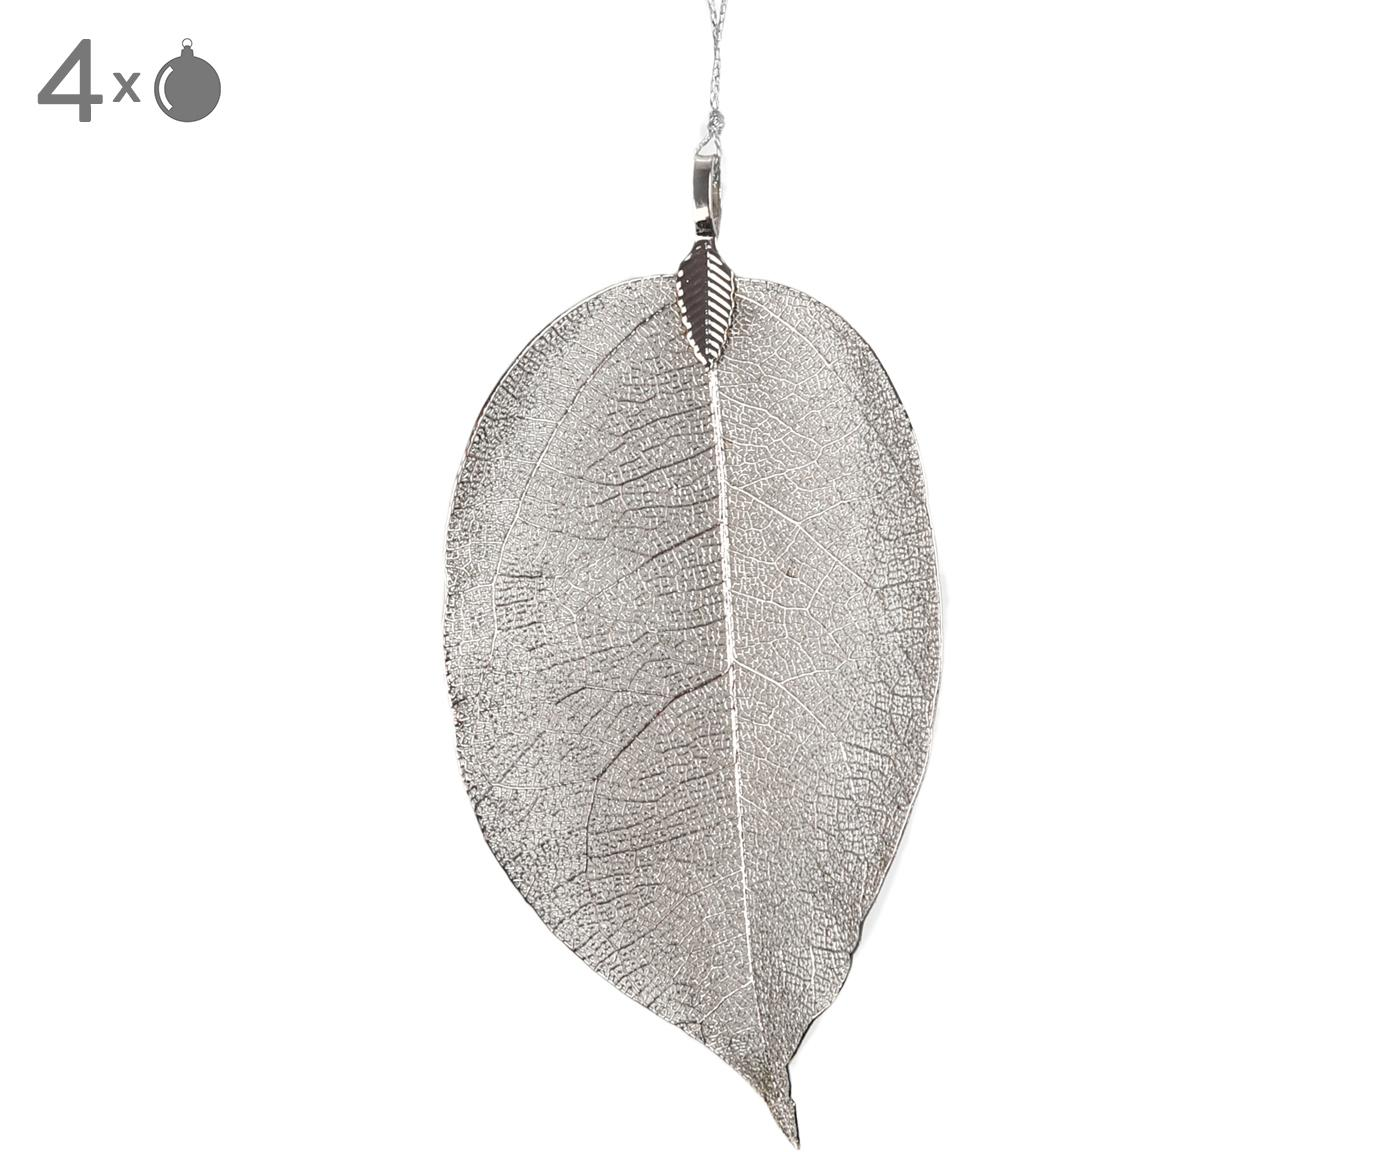 Adornos navideños XL Leava, 4uds., Ojal: metal reubierto, Plateado, An 6 x Al 17 cm